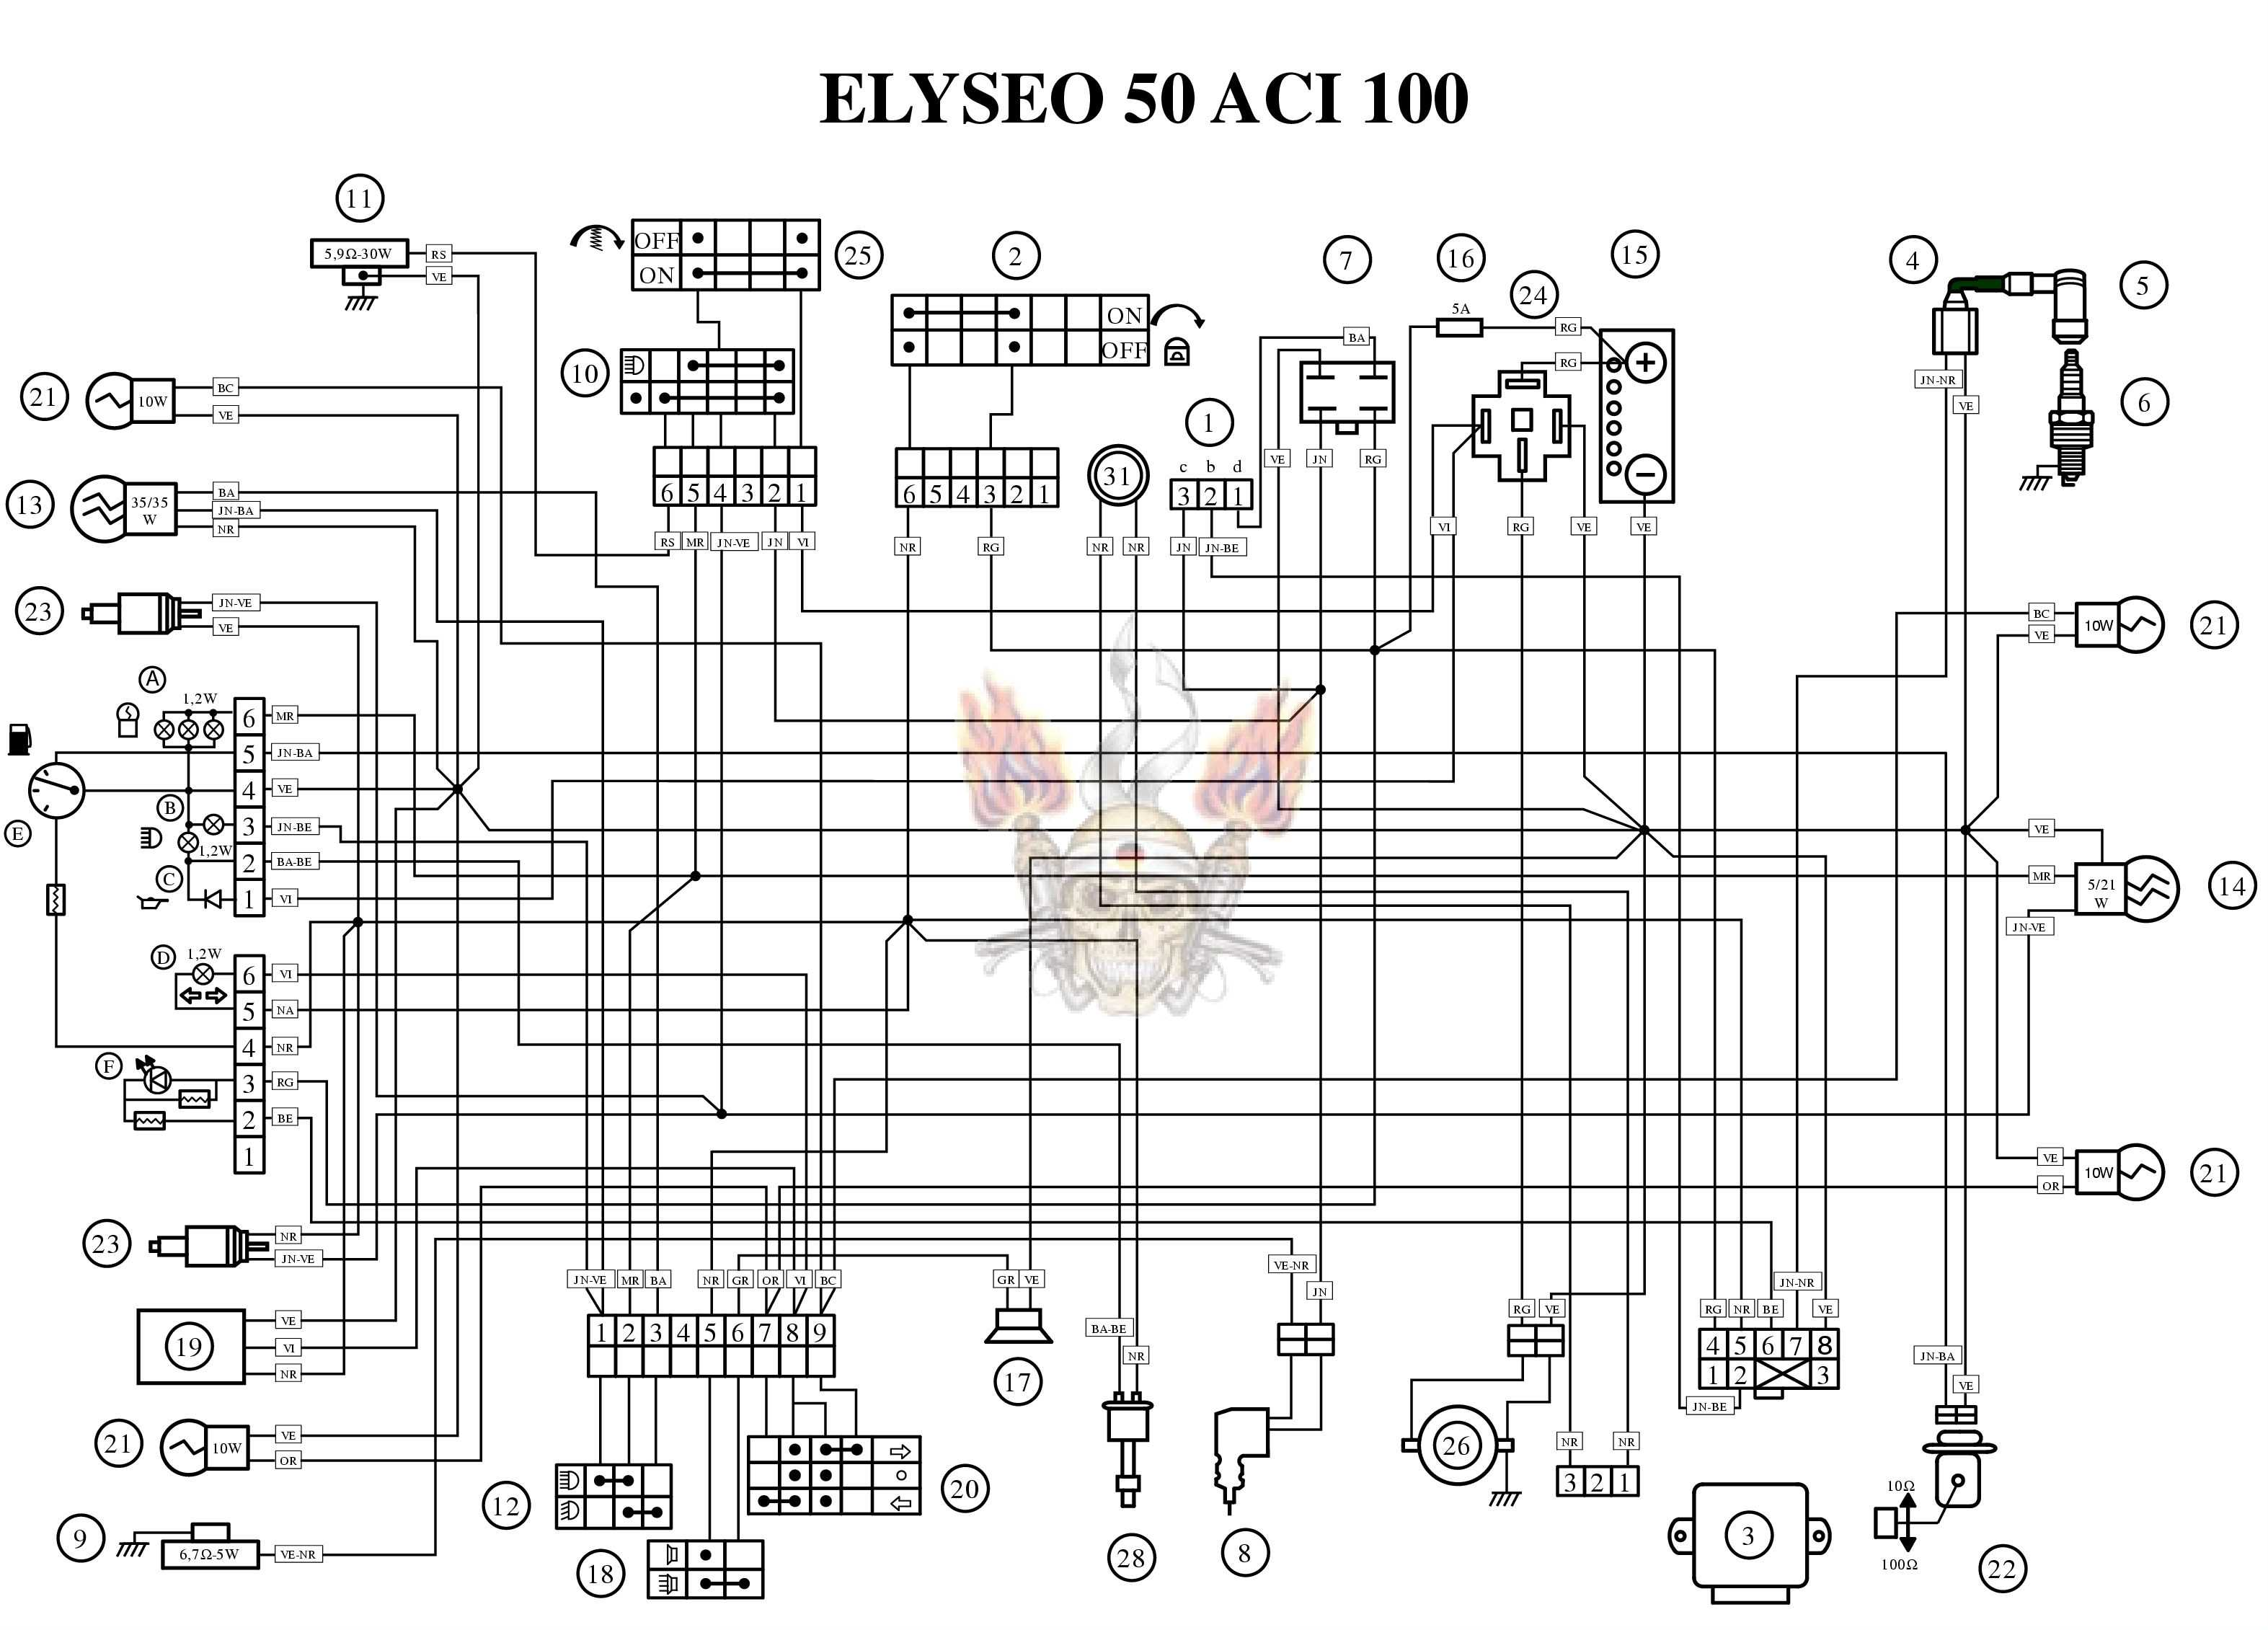 Wiring Diagram Peugeot ELYSEO 50 ACI 100?t\\\\\\=1485078190 peugeot 308 wiring diagram download wiring diagram and schematic c90 wiring diagram at readyjetset.co